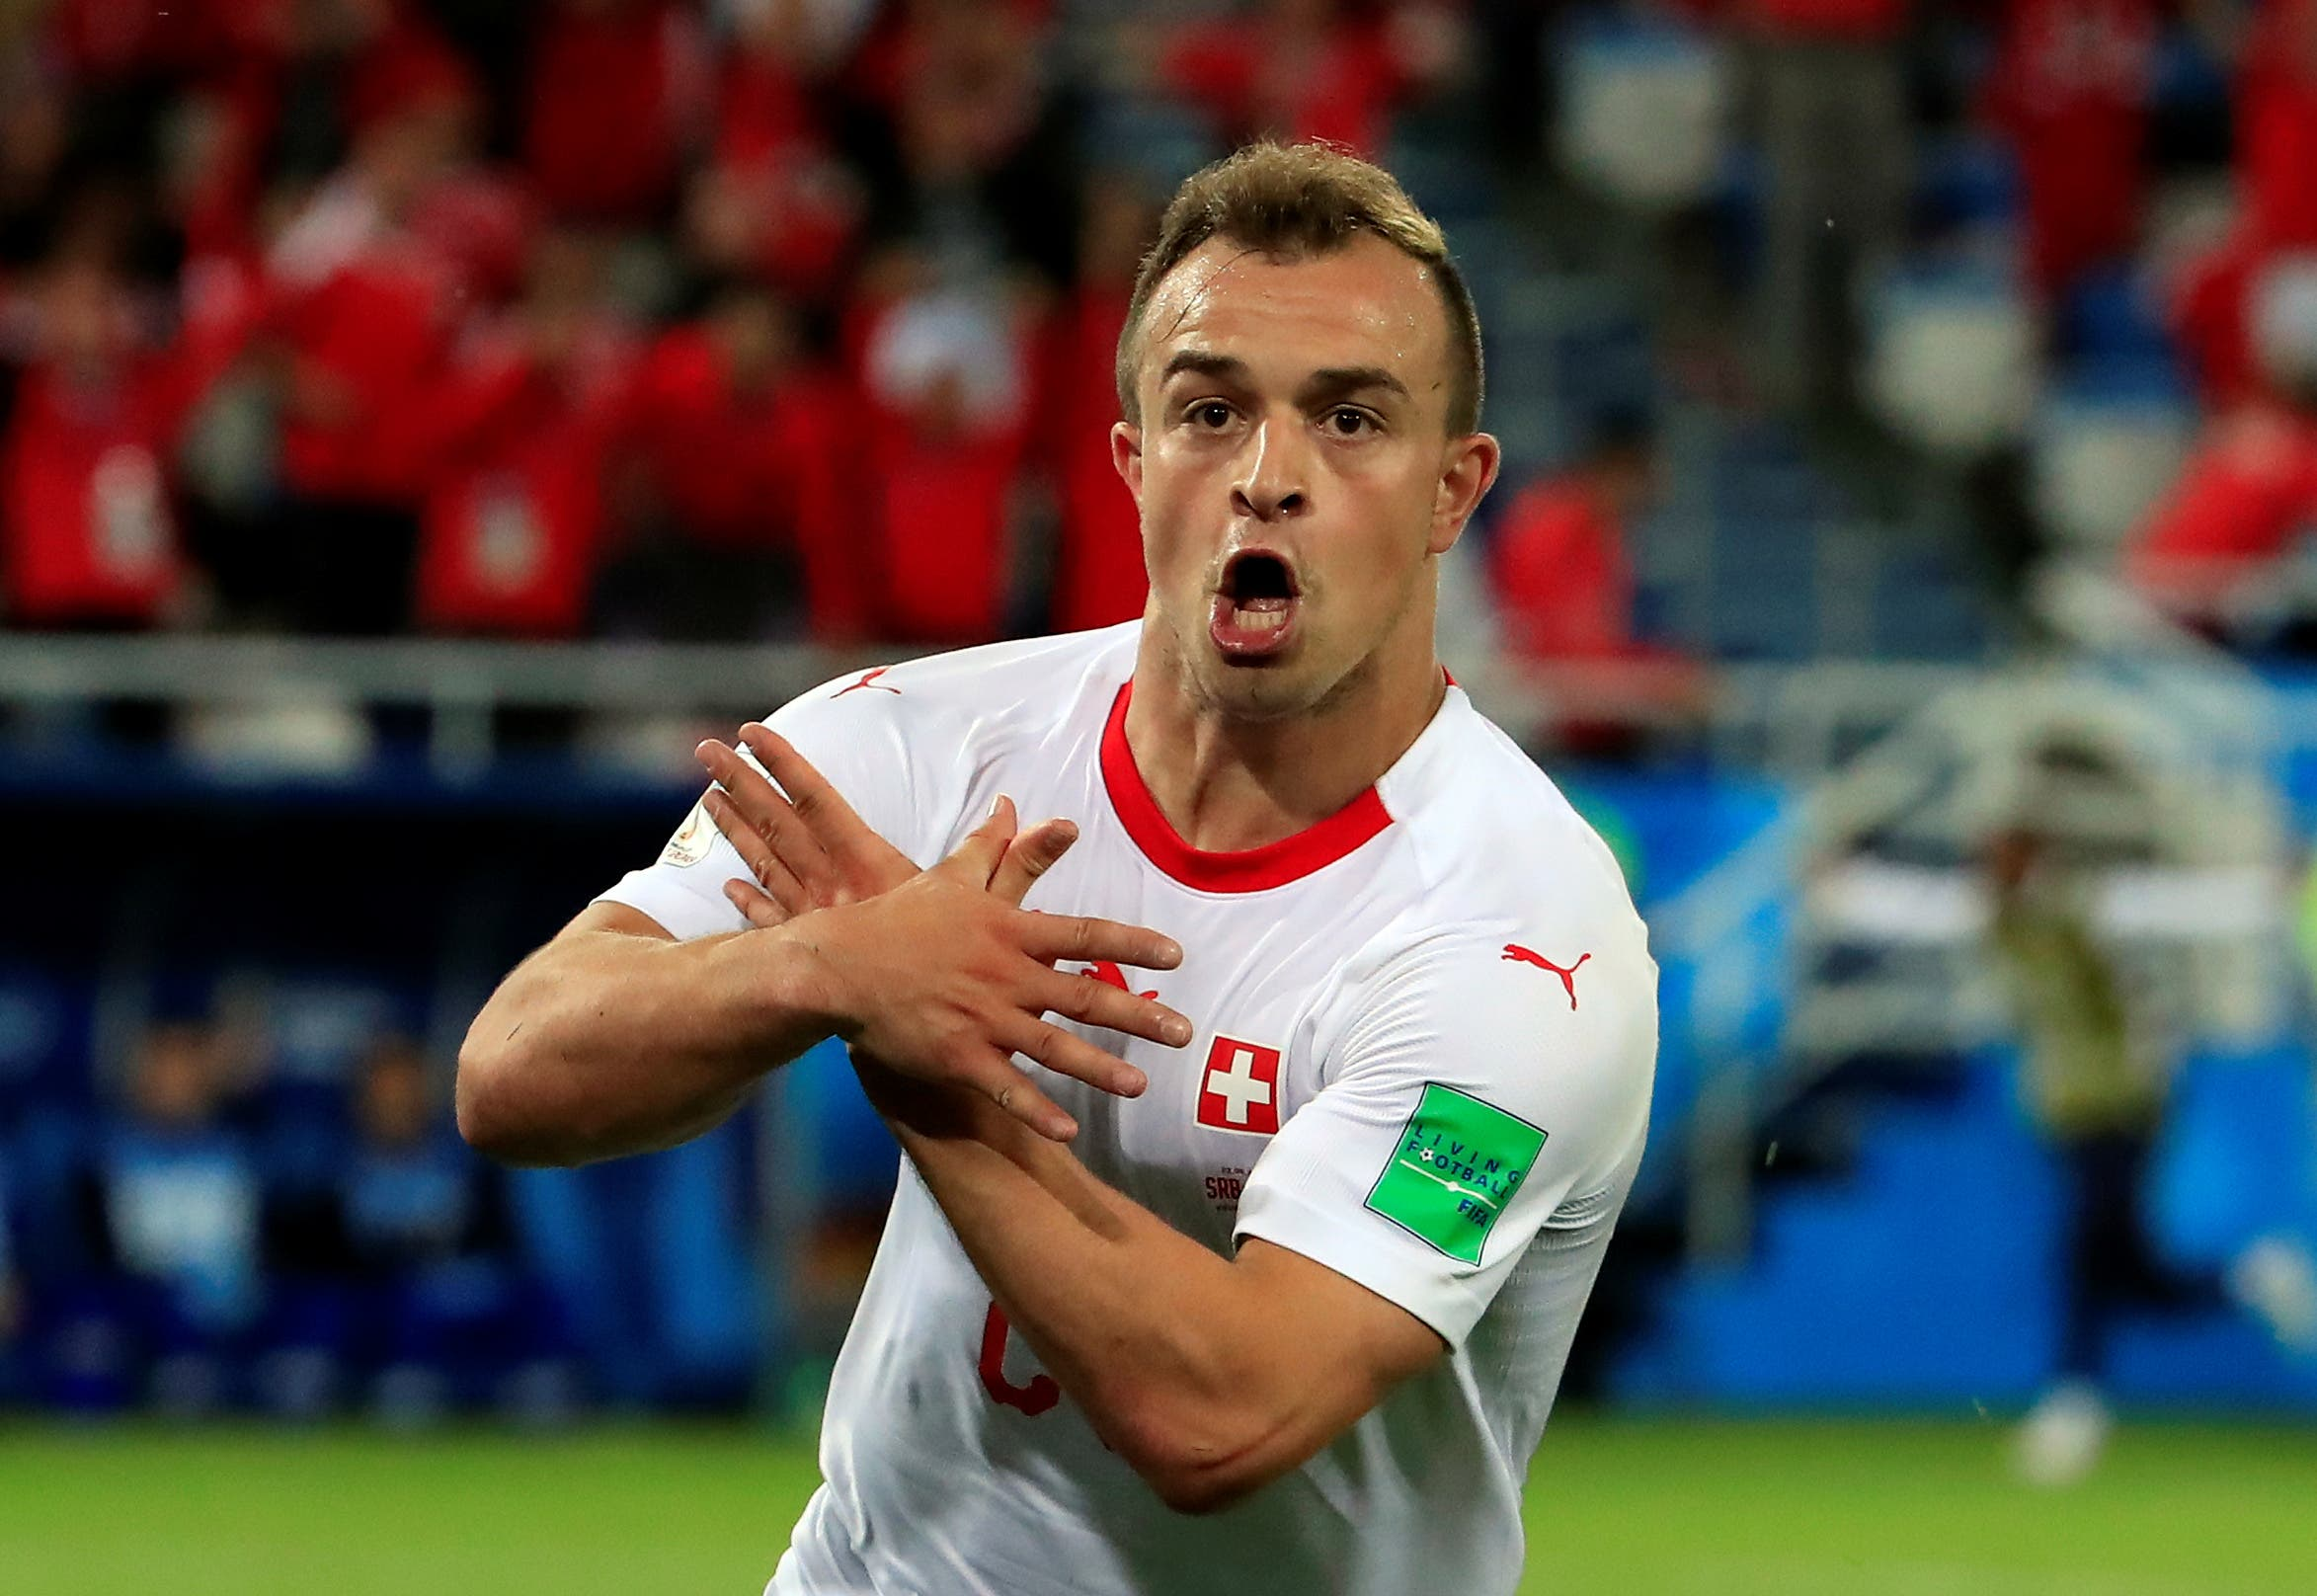 Xherdan Shaqiri celebrates his goal agaisnt South Korea which gave Switzerland the lead. (Reuters)